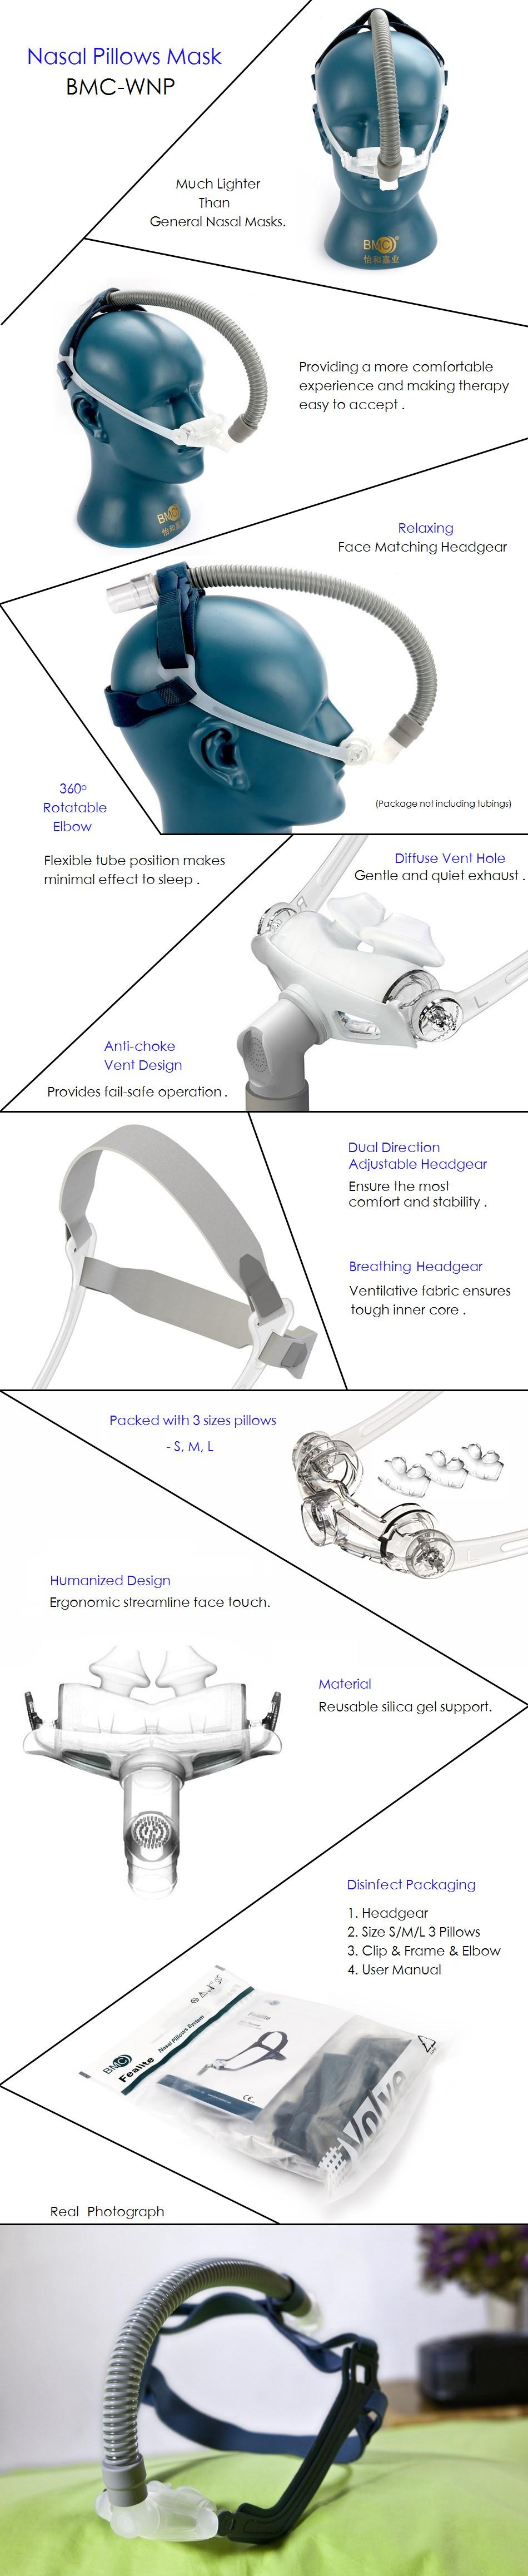 CPAP APAP BiPAP WNP Nasal Pillow Mask (1)